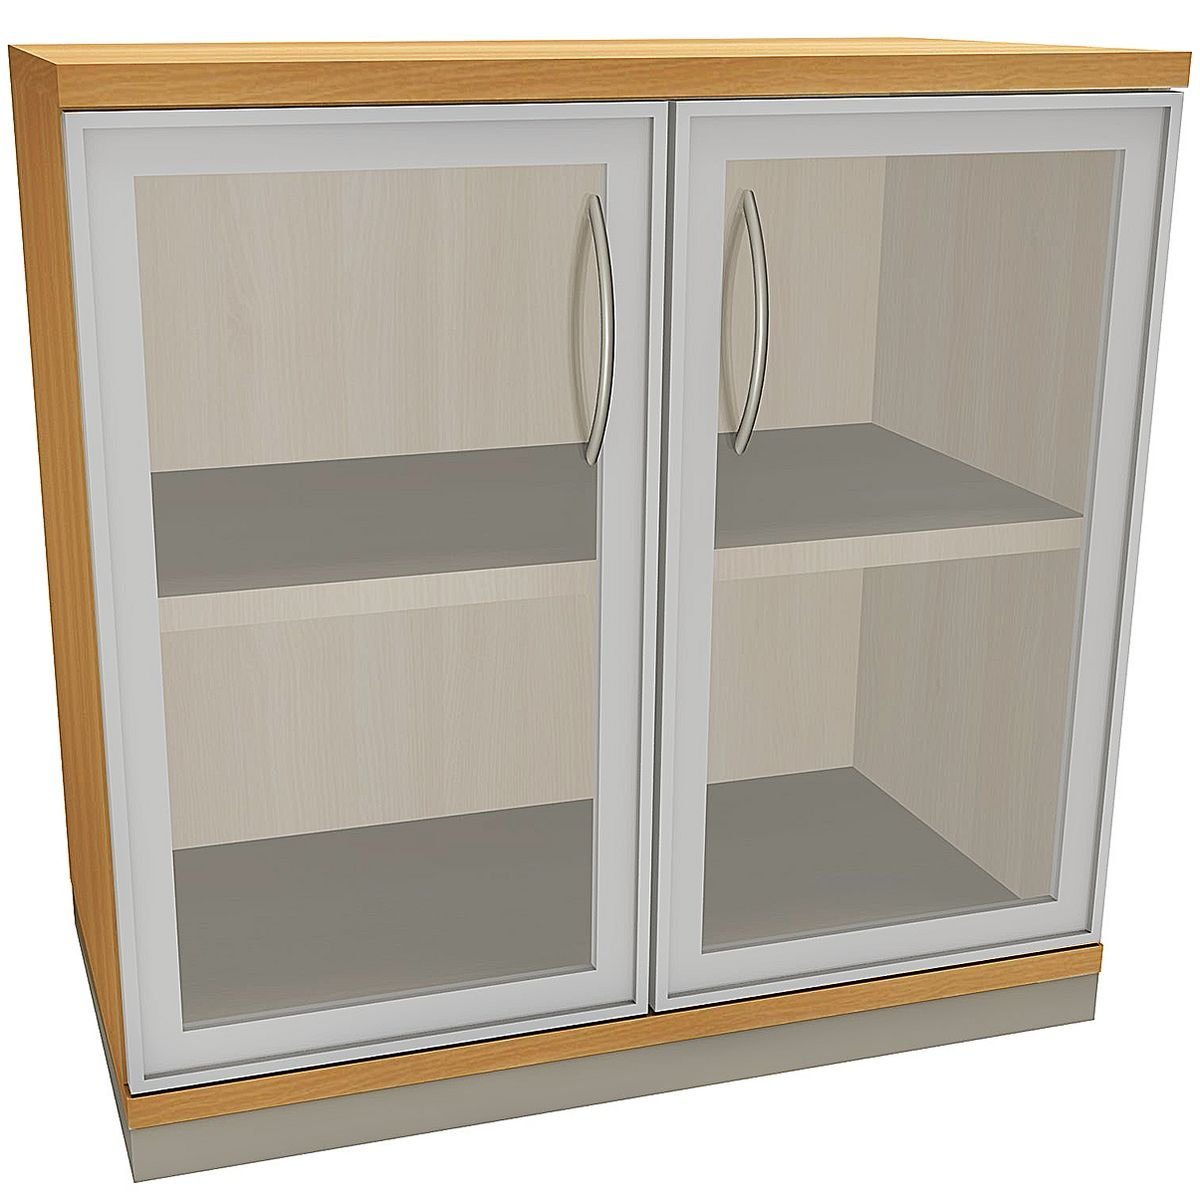 FMBUEROMOEBEL Aktenschrank 2 OH klare Acrylglastüren »Sidney« | Büro > Büroschränke > Aktenschränke | FMBUEROMOEBEL